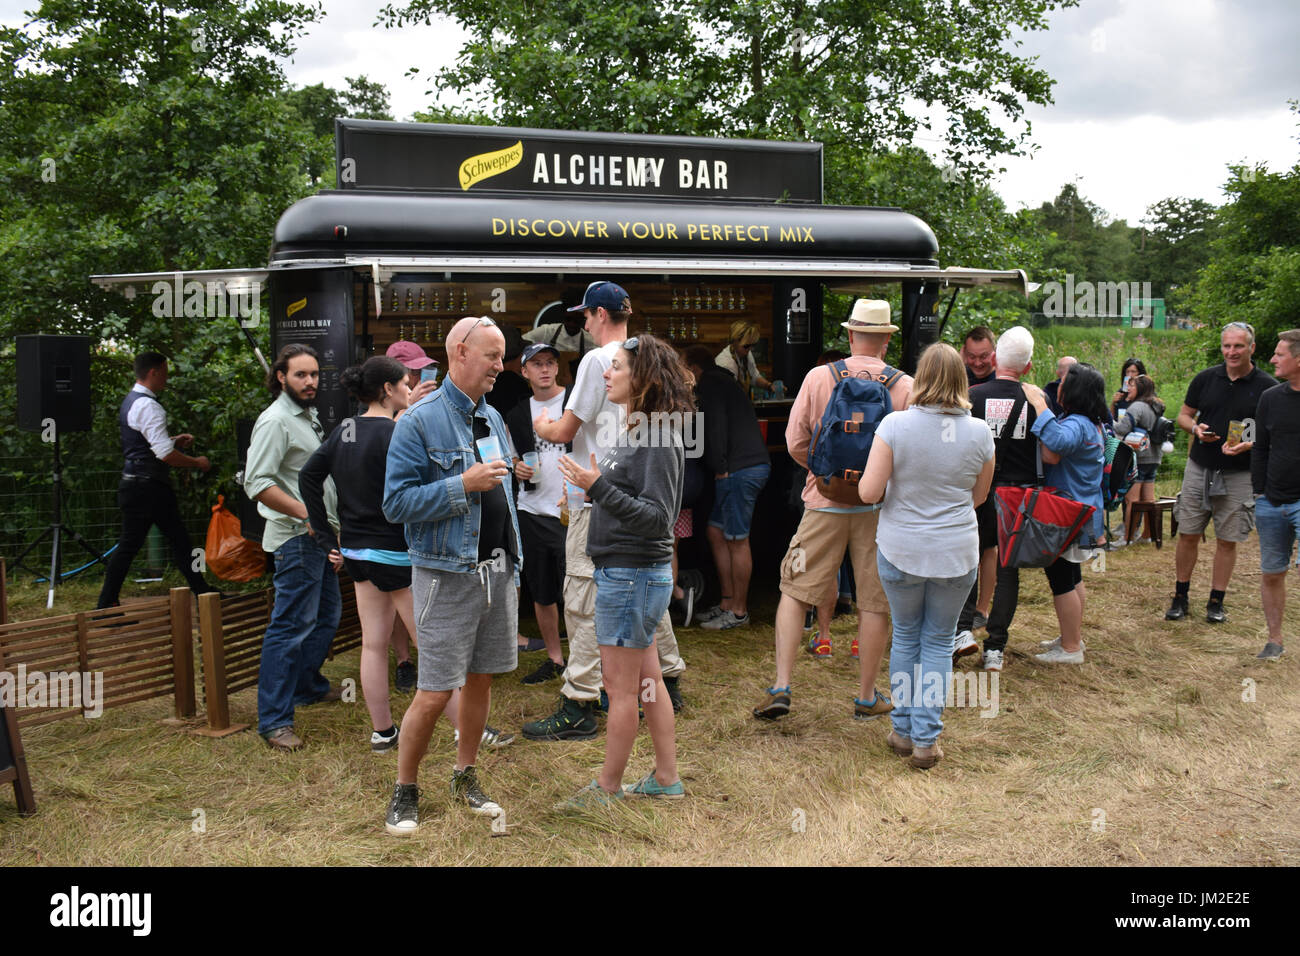 Latitude Festival 2017, Henham Park, Suffolk, UK. New for 2017, Alchemy gin & tonic bar sponsored by Schweppes. - Stock Image